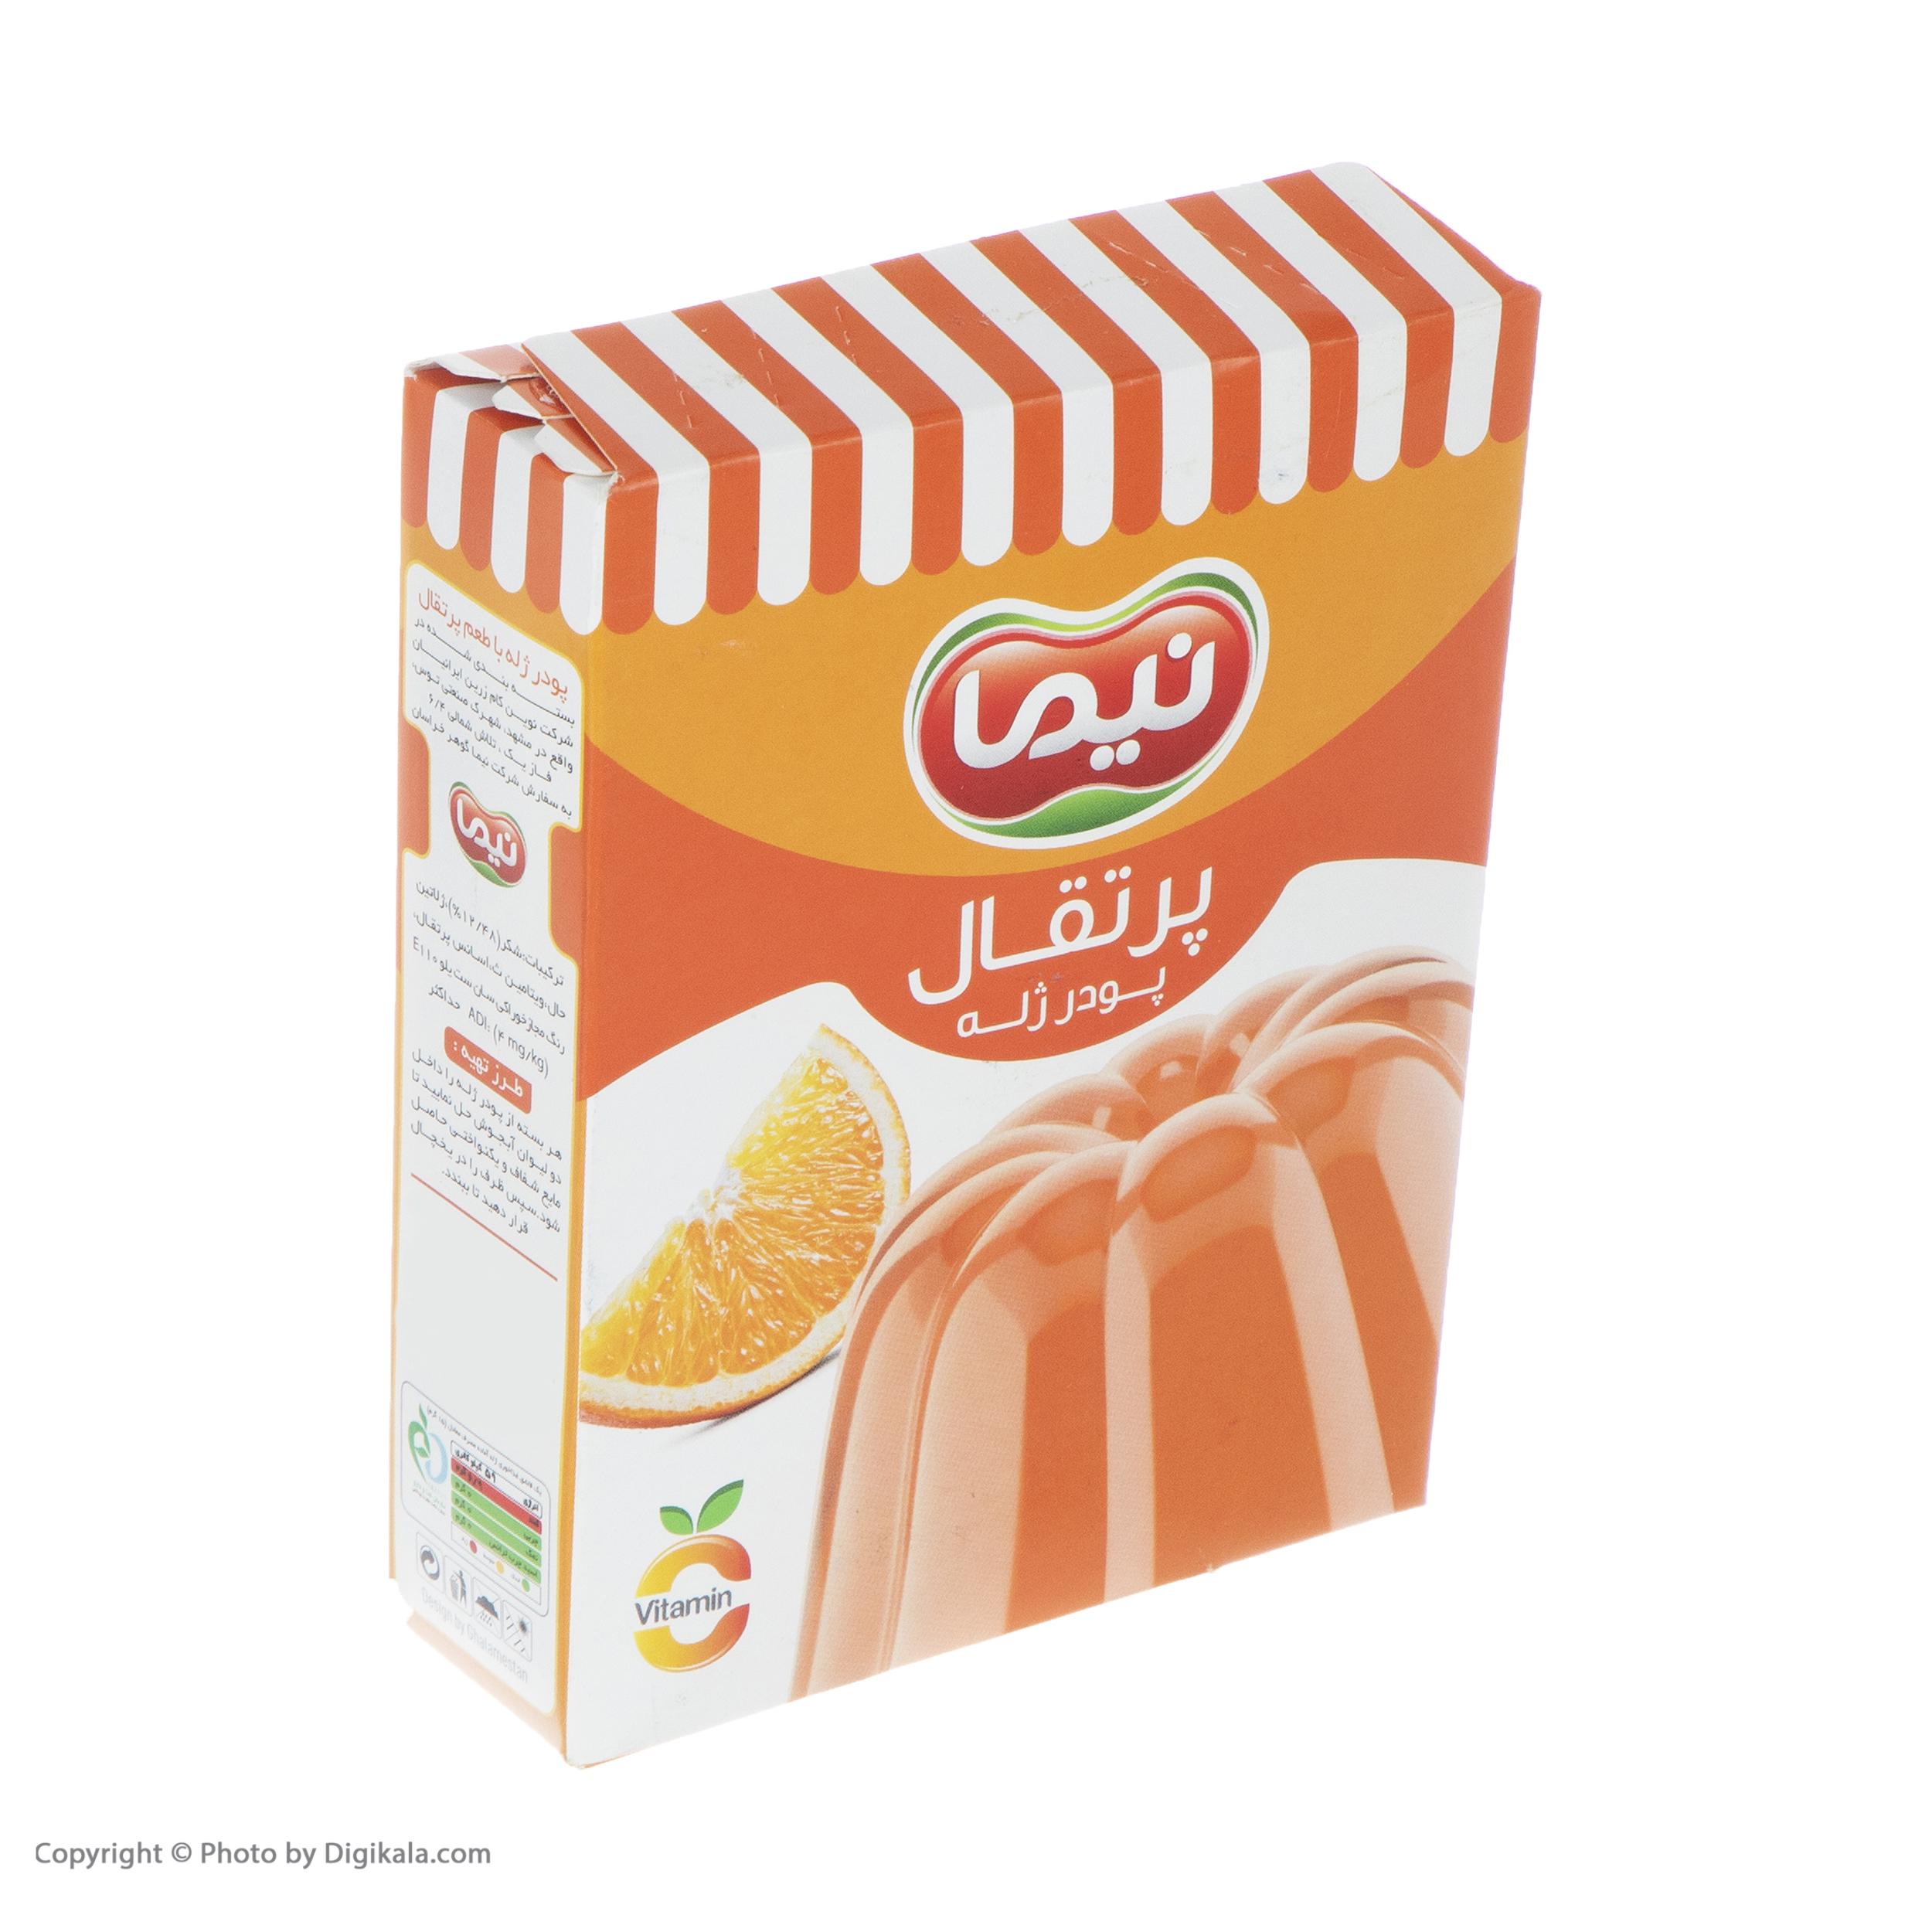 پودر ژله پرتقال نیما - 100 گرم